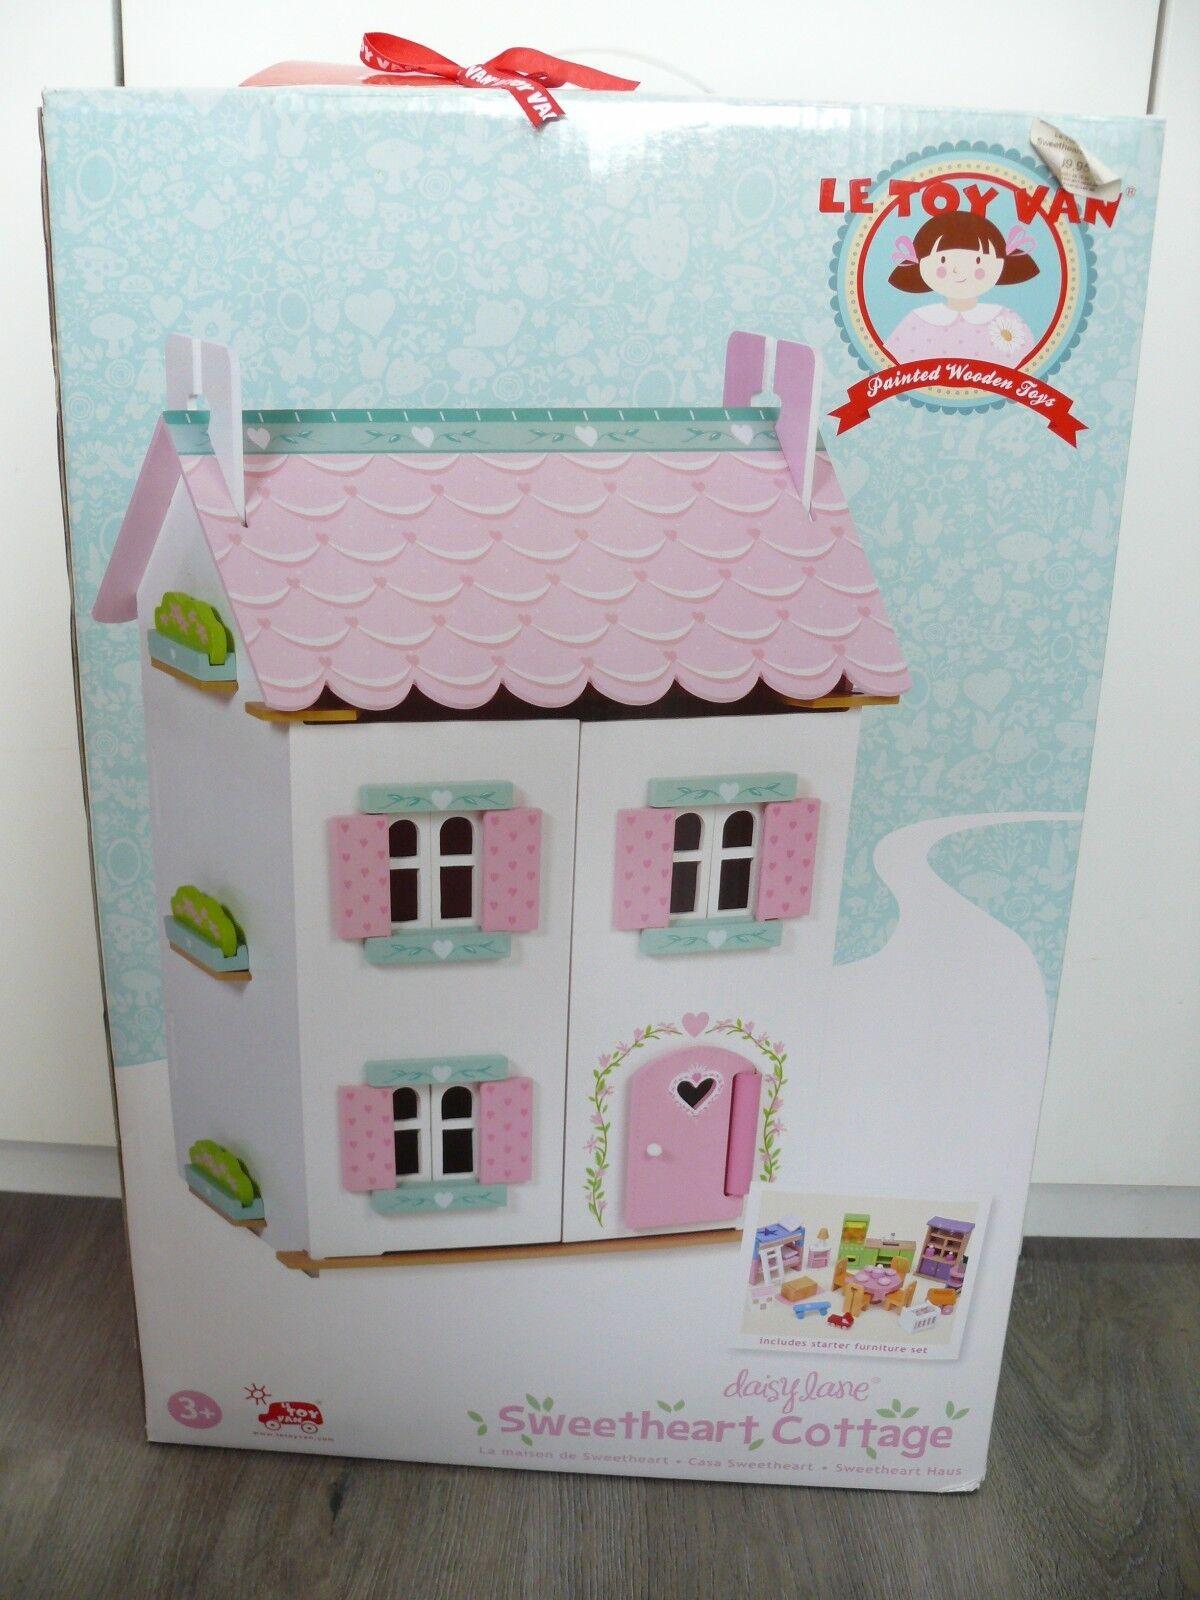 Le Toy Van daisylane Sweetheart Cottage casa delle bambole con Intelaiatura-NUOVO & OVP